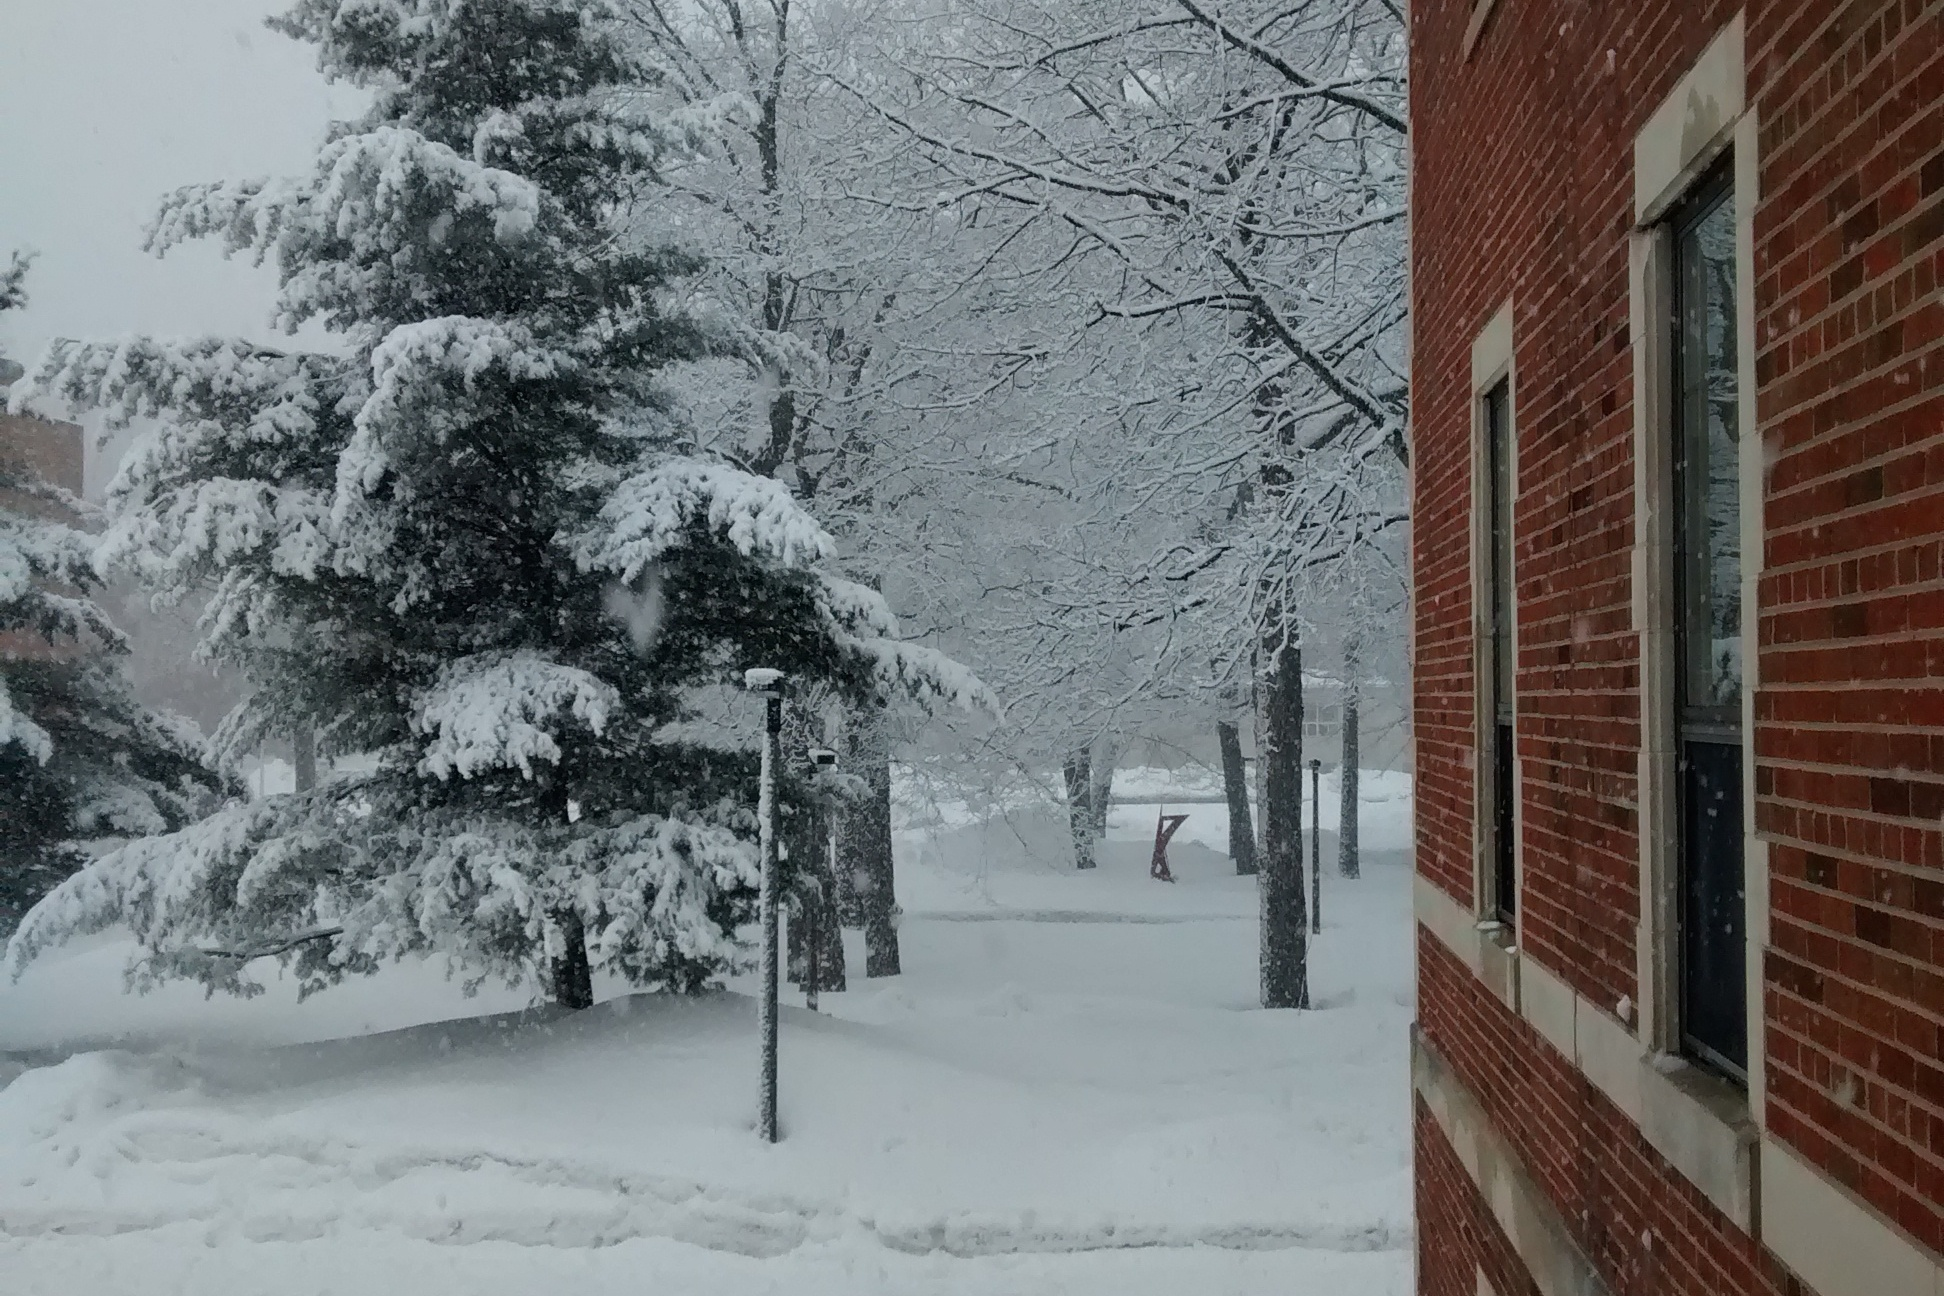 Snowy trees outside Douglass Houghton Hall